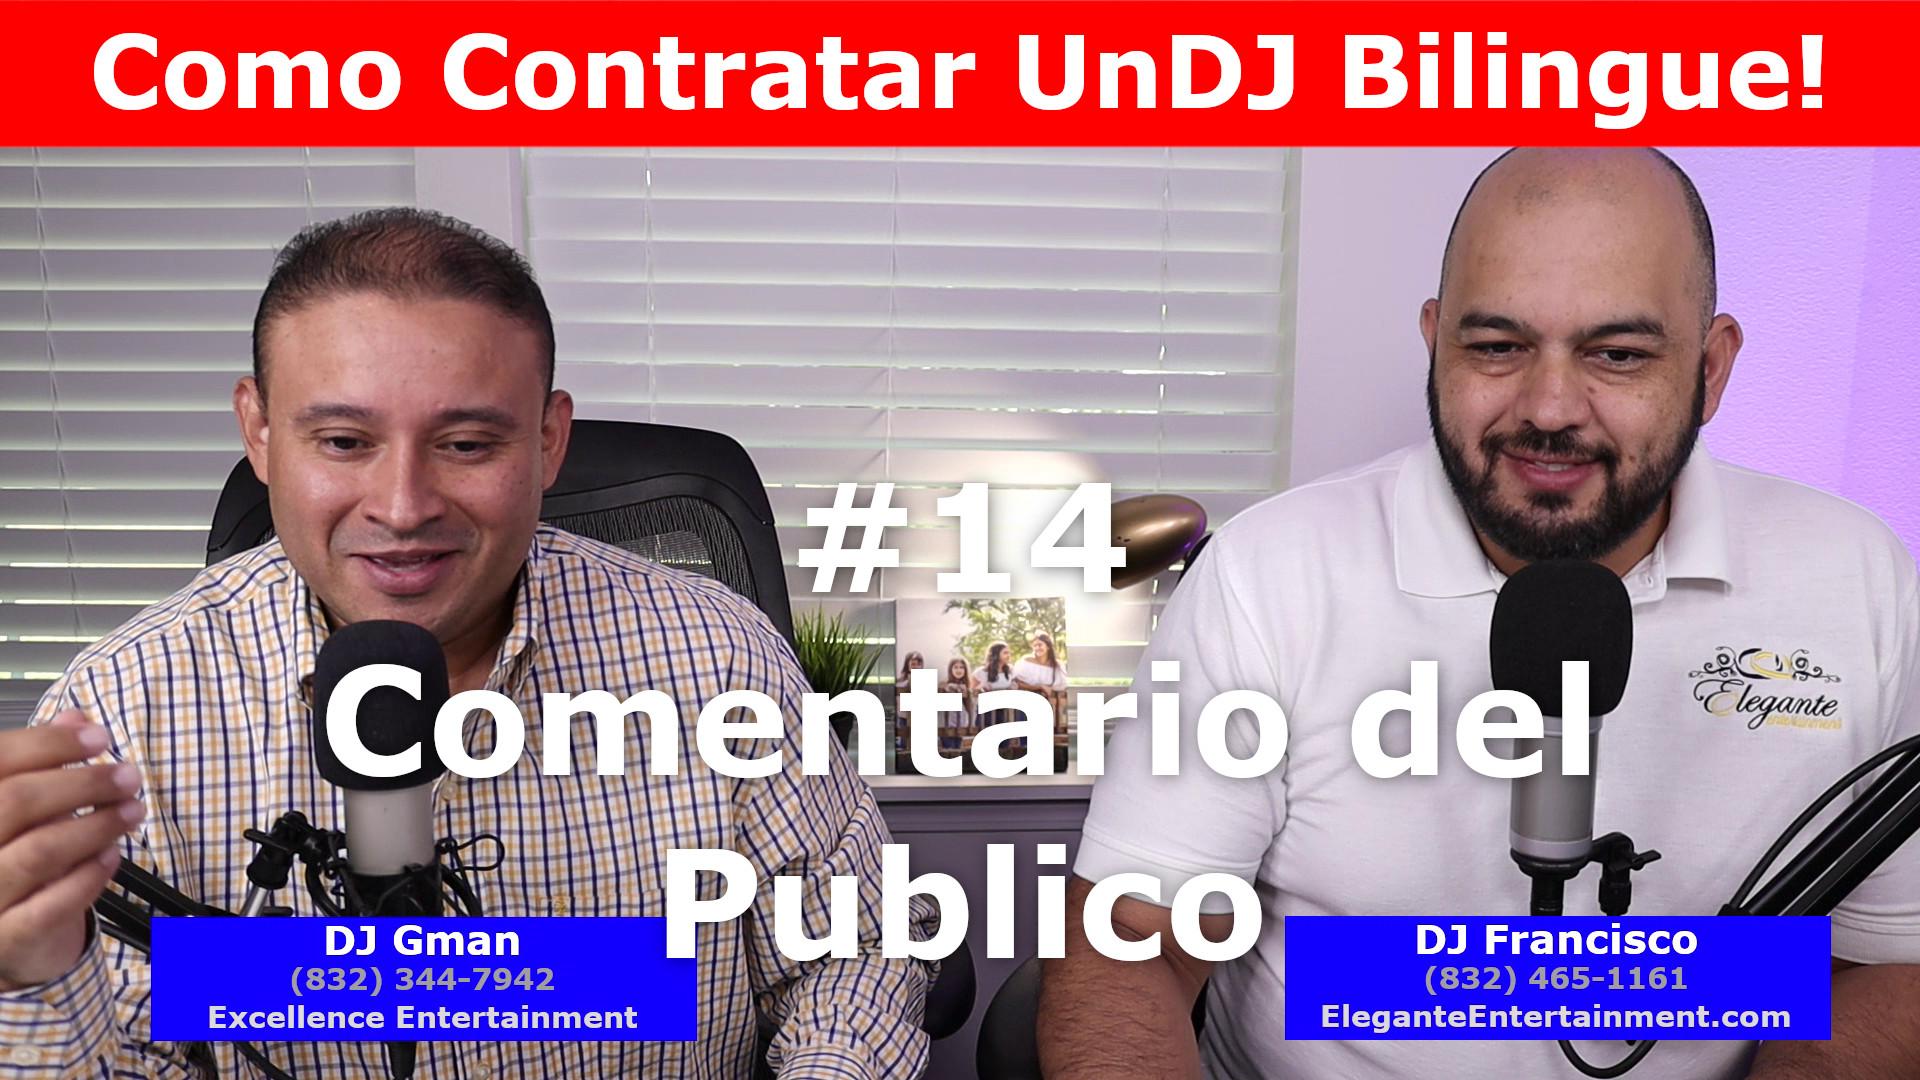 DJ in Houston | #13 Public Comment